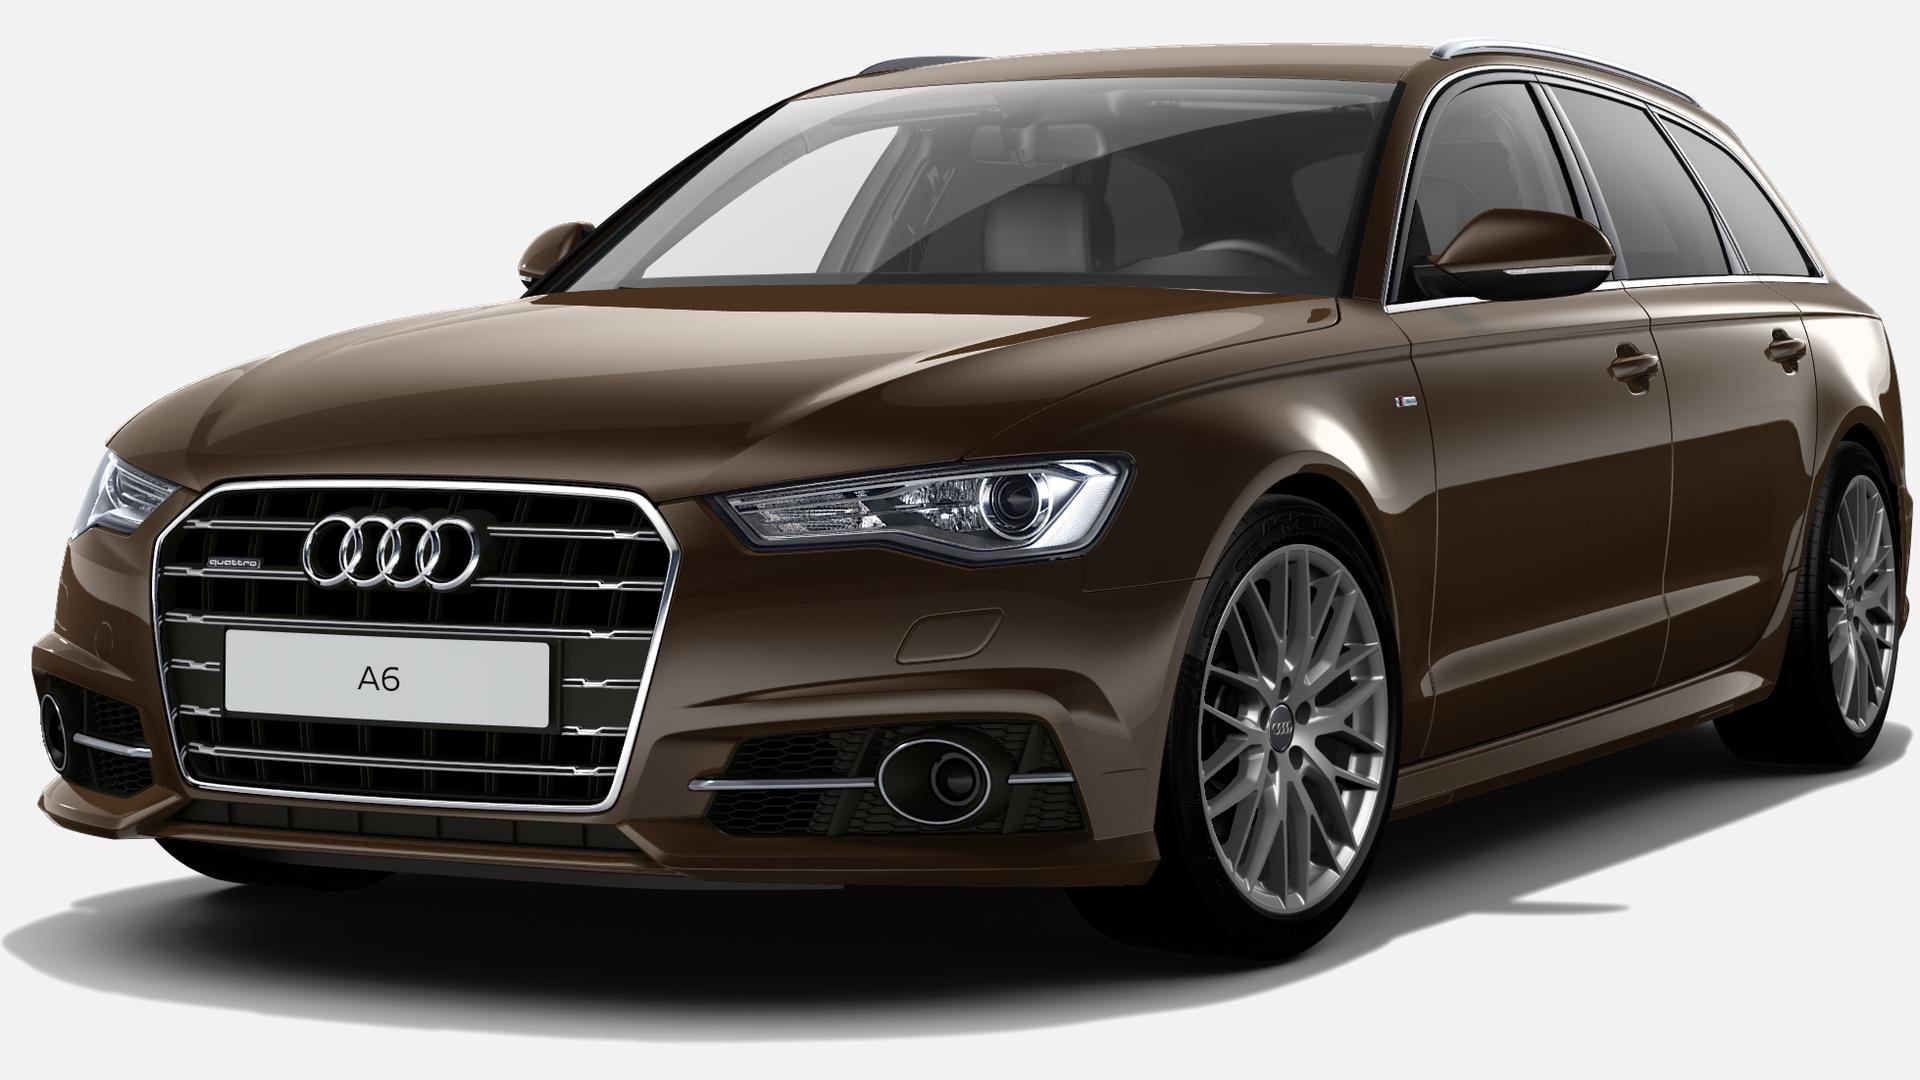 Audi A6 Avant 2.0 TDI S Line Edition quattro S Tronic 140 kW (190 CV)  nuevo en Guipuzcoa